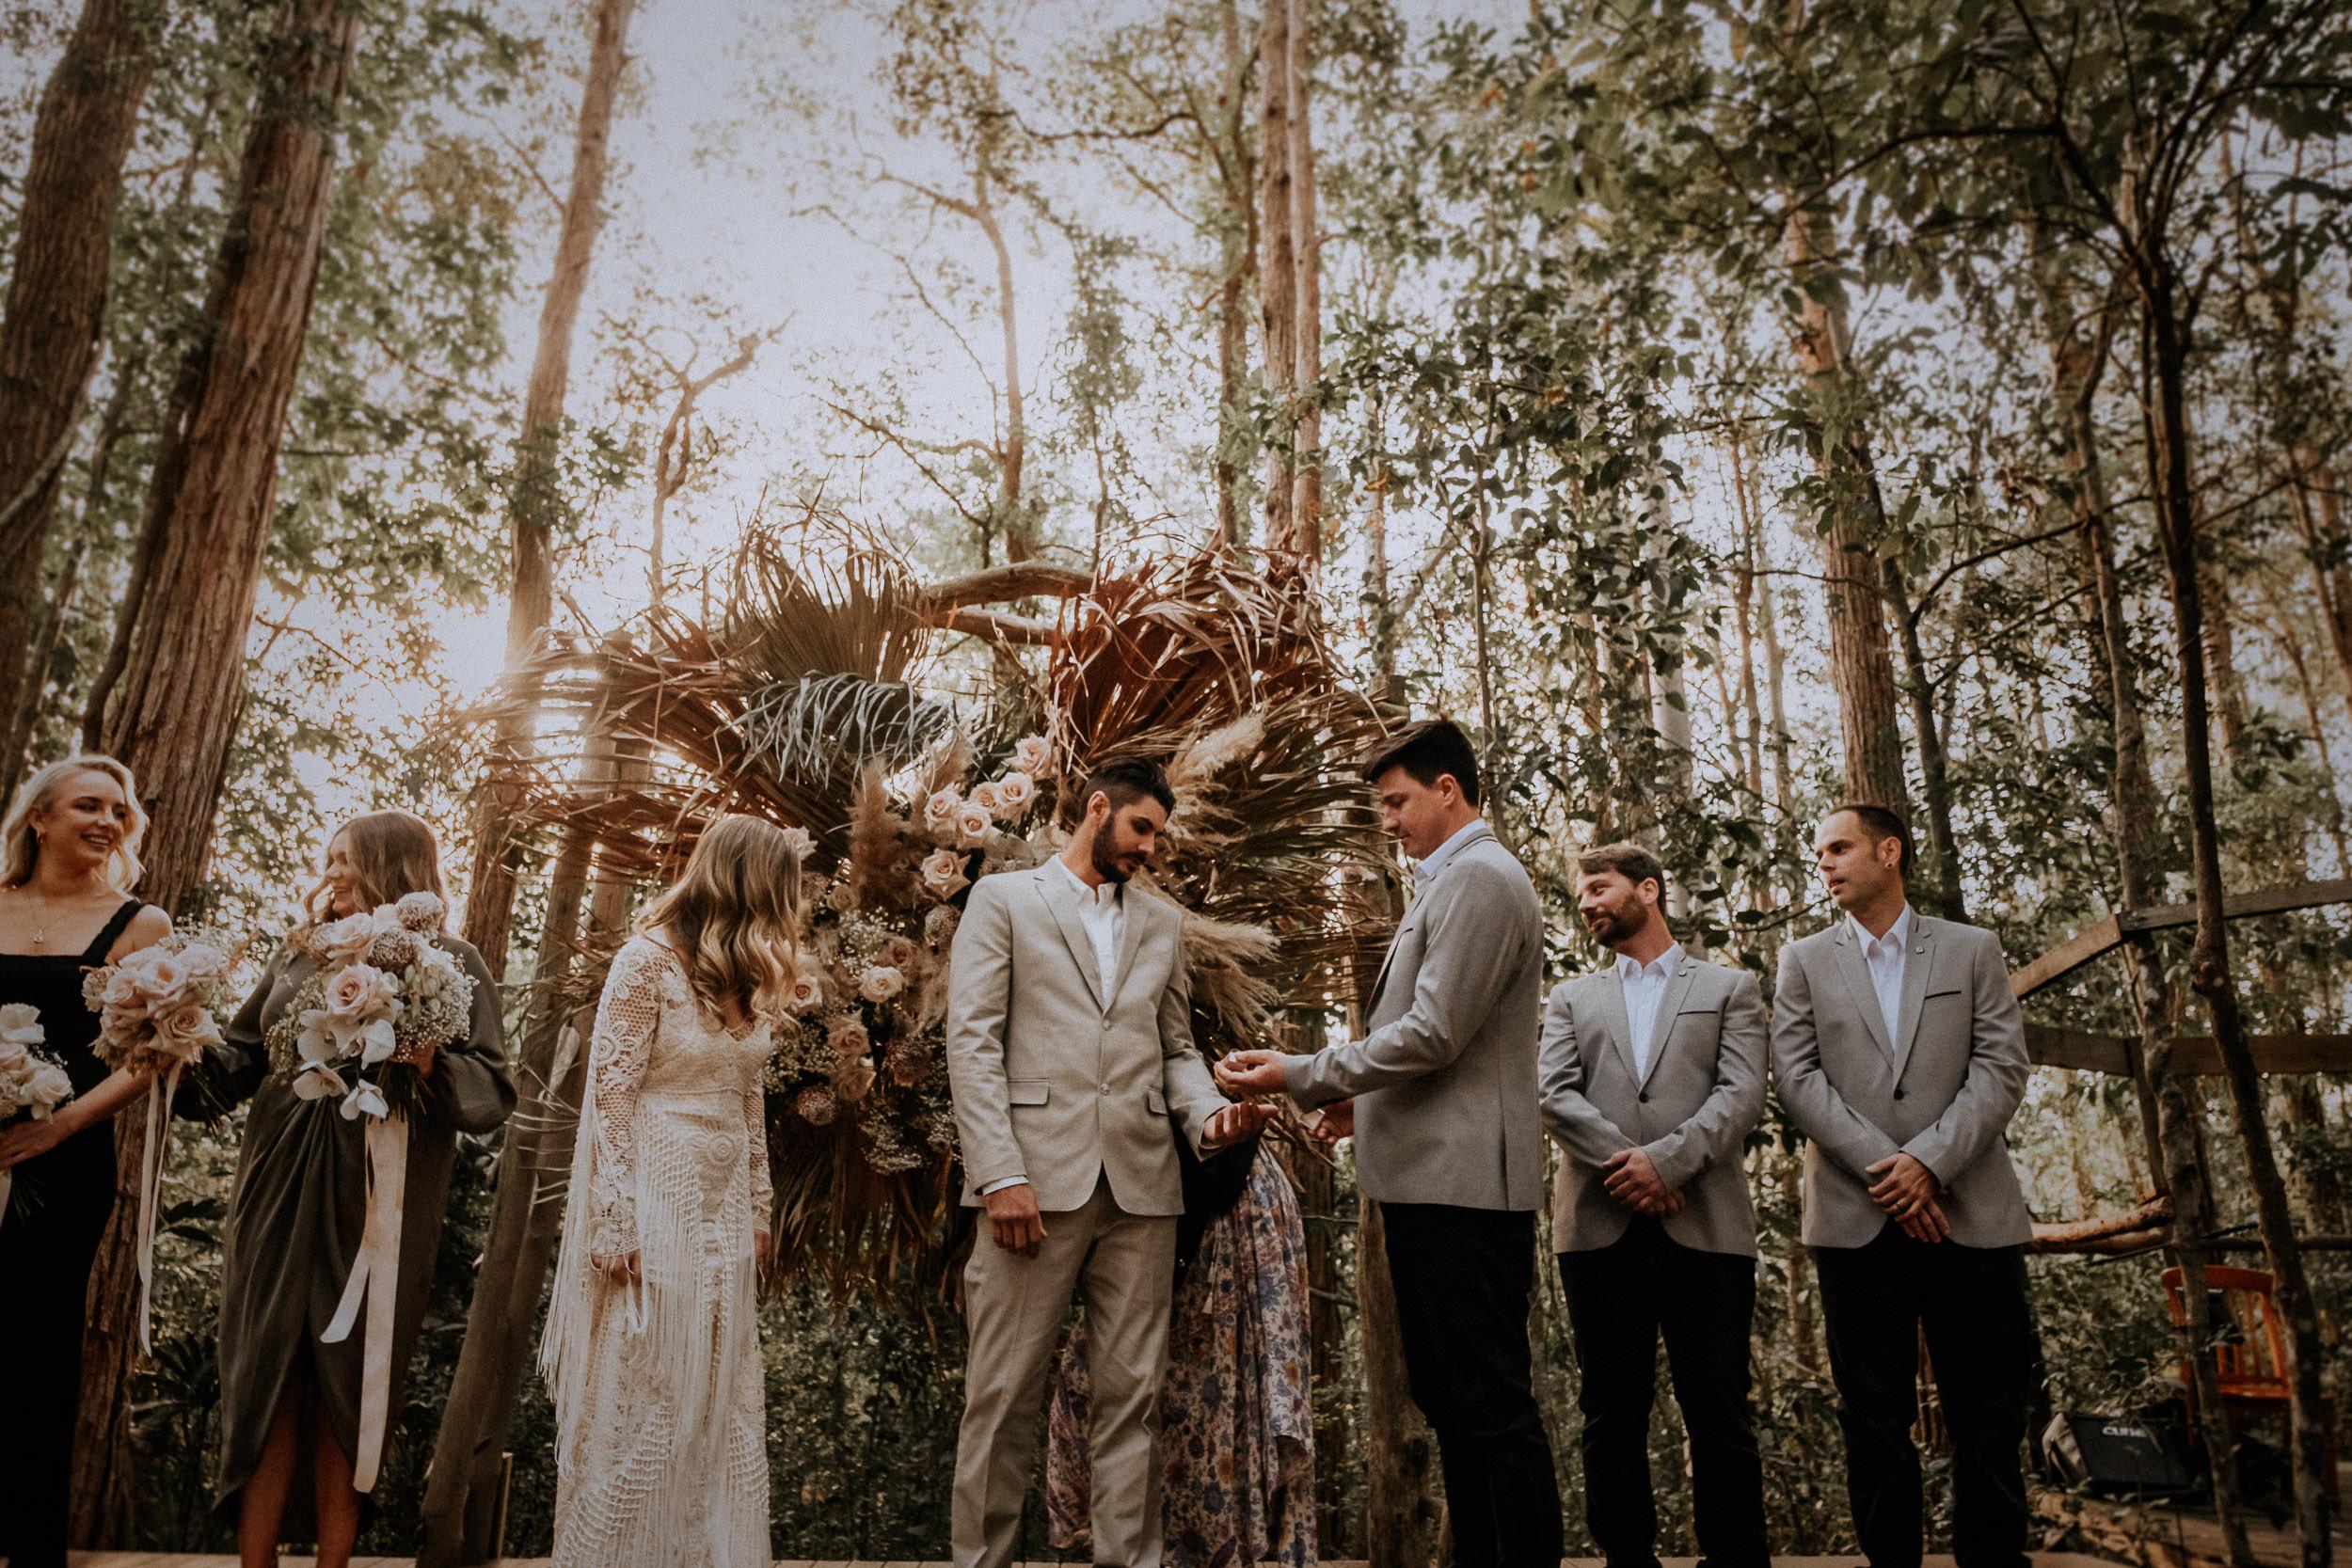 S&A Elopement - Kings & Thieves - Shred 'Til Dead - Central Coast Beach Forest Wedding - 207.jpg